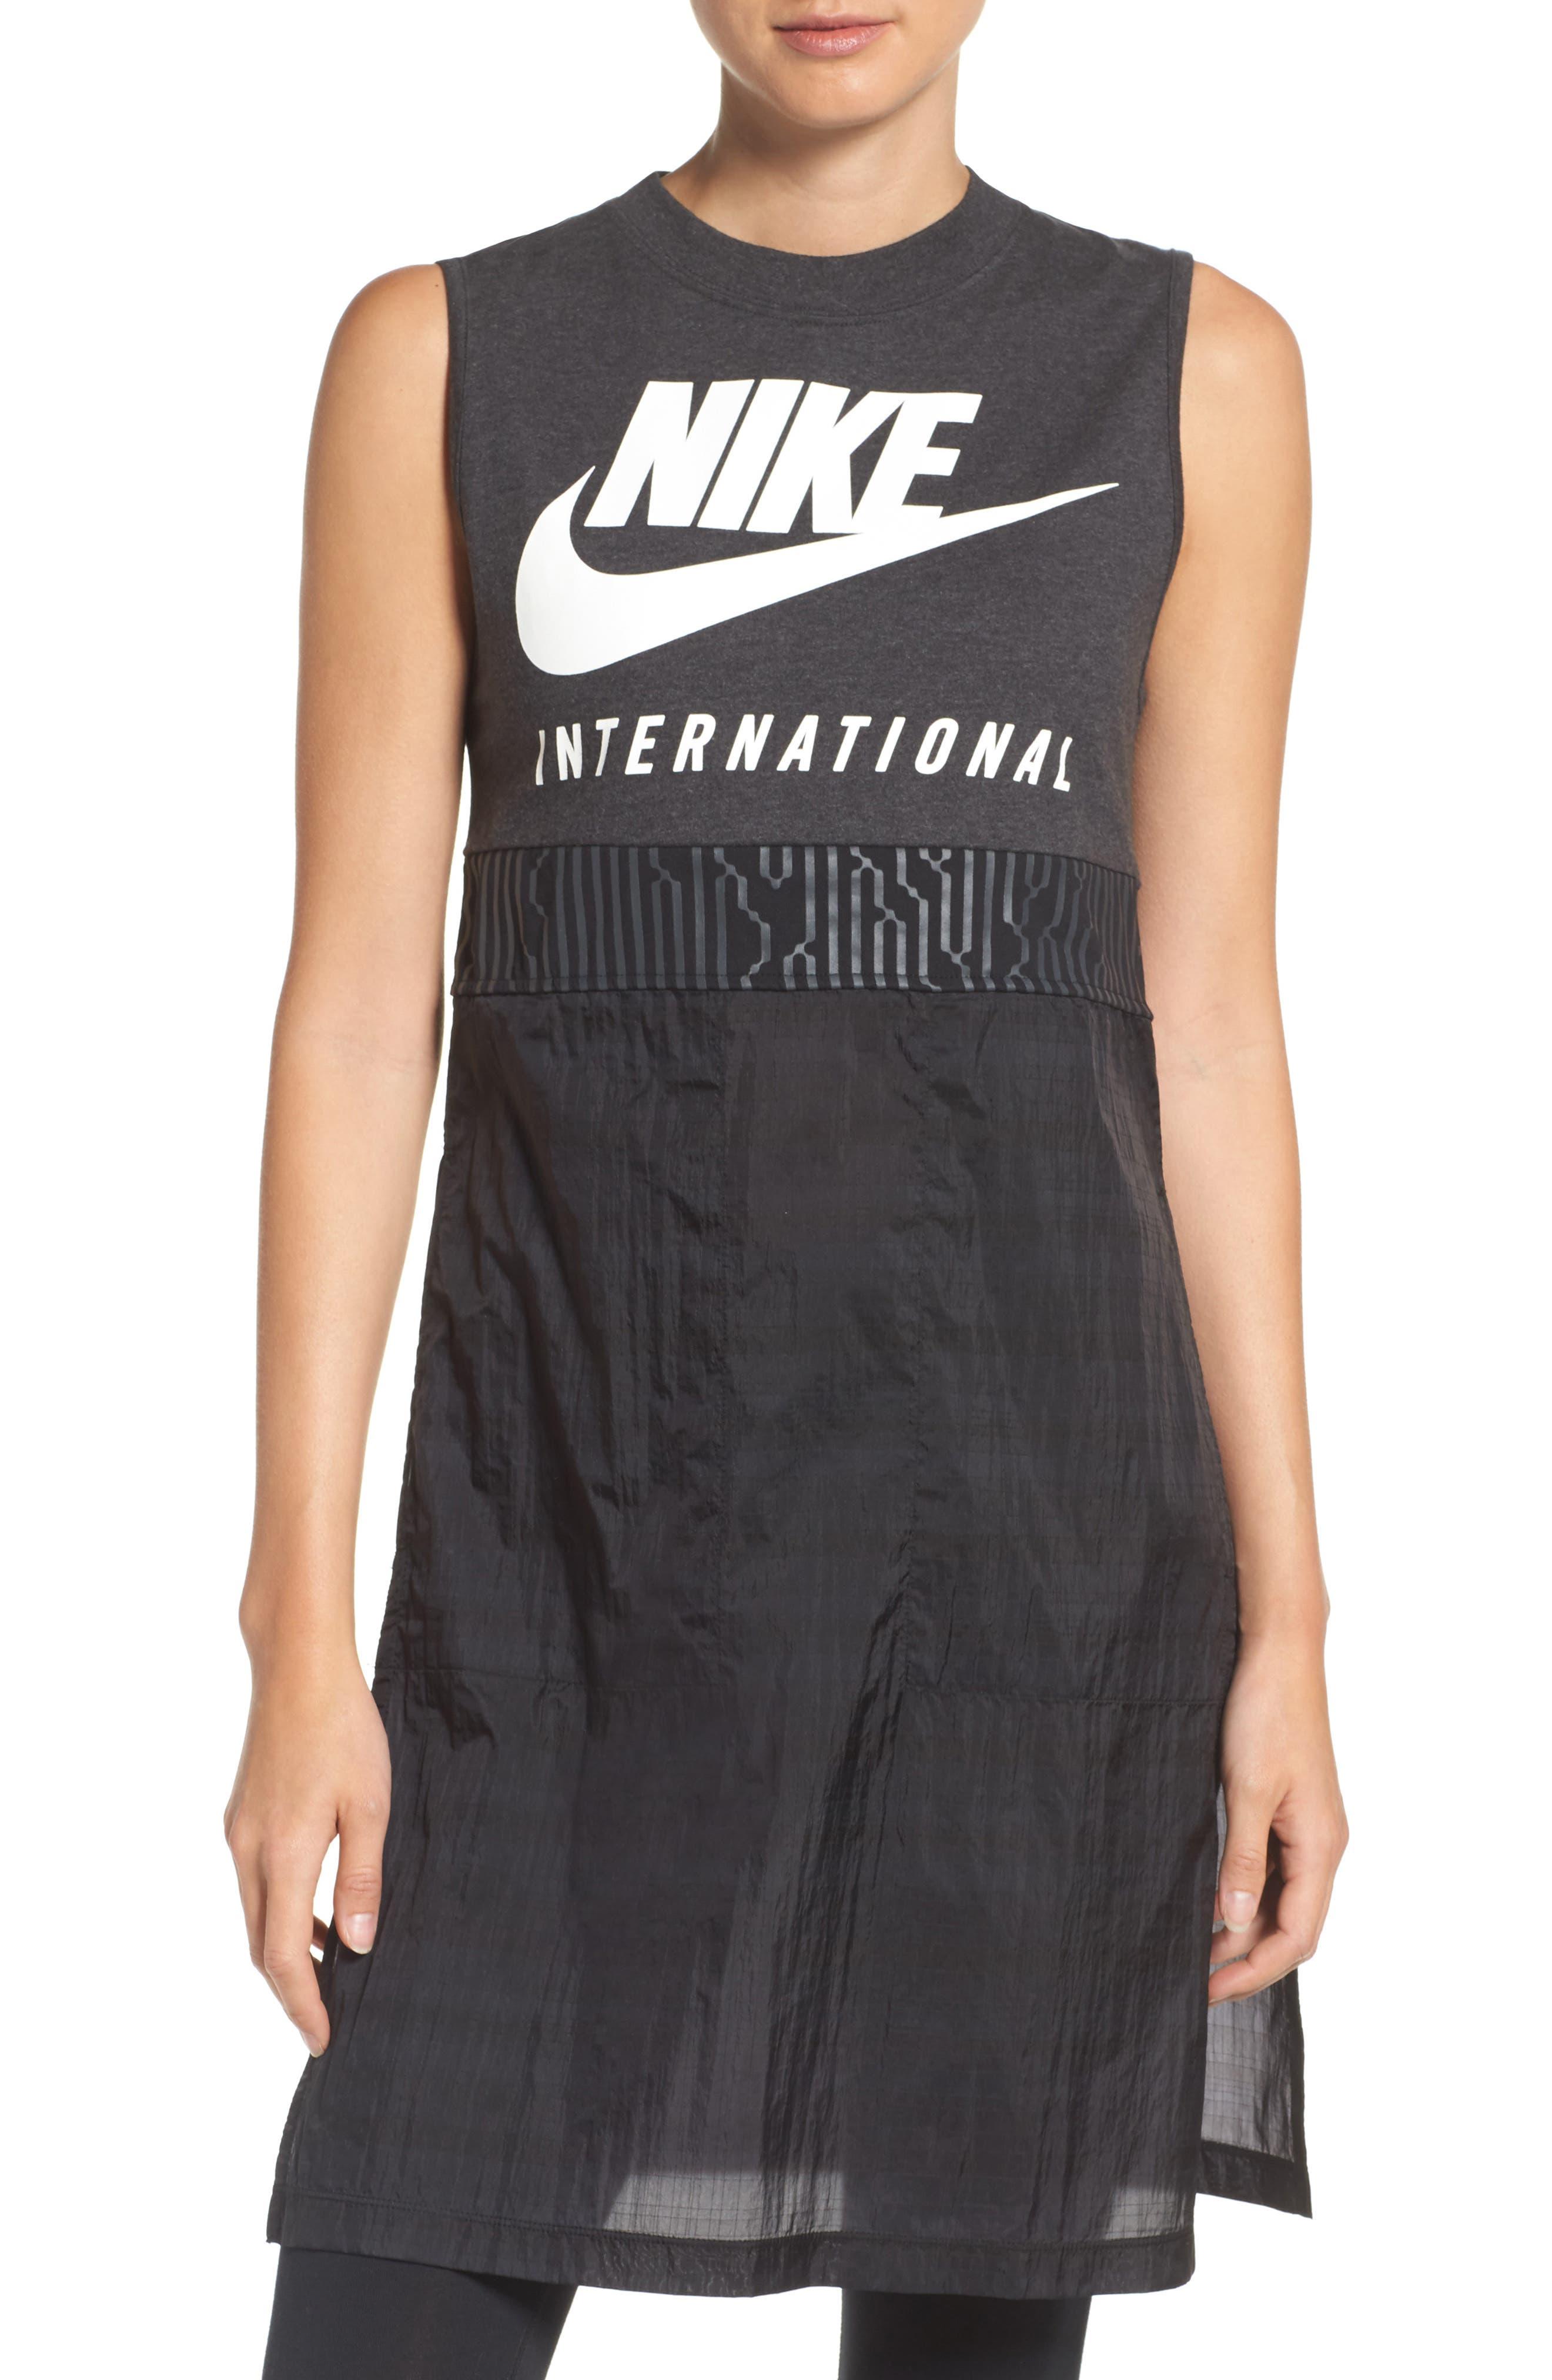 Nike International Tunic Tank